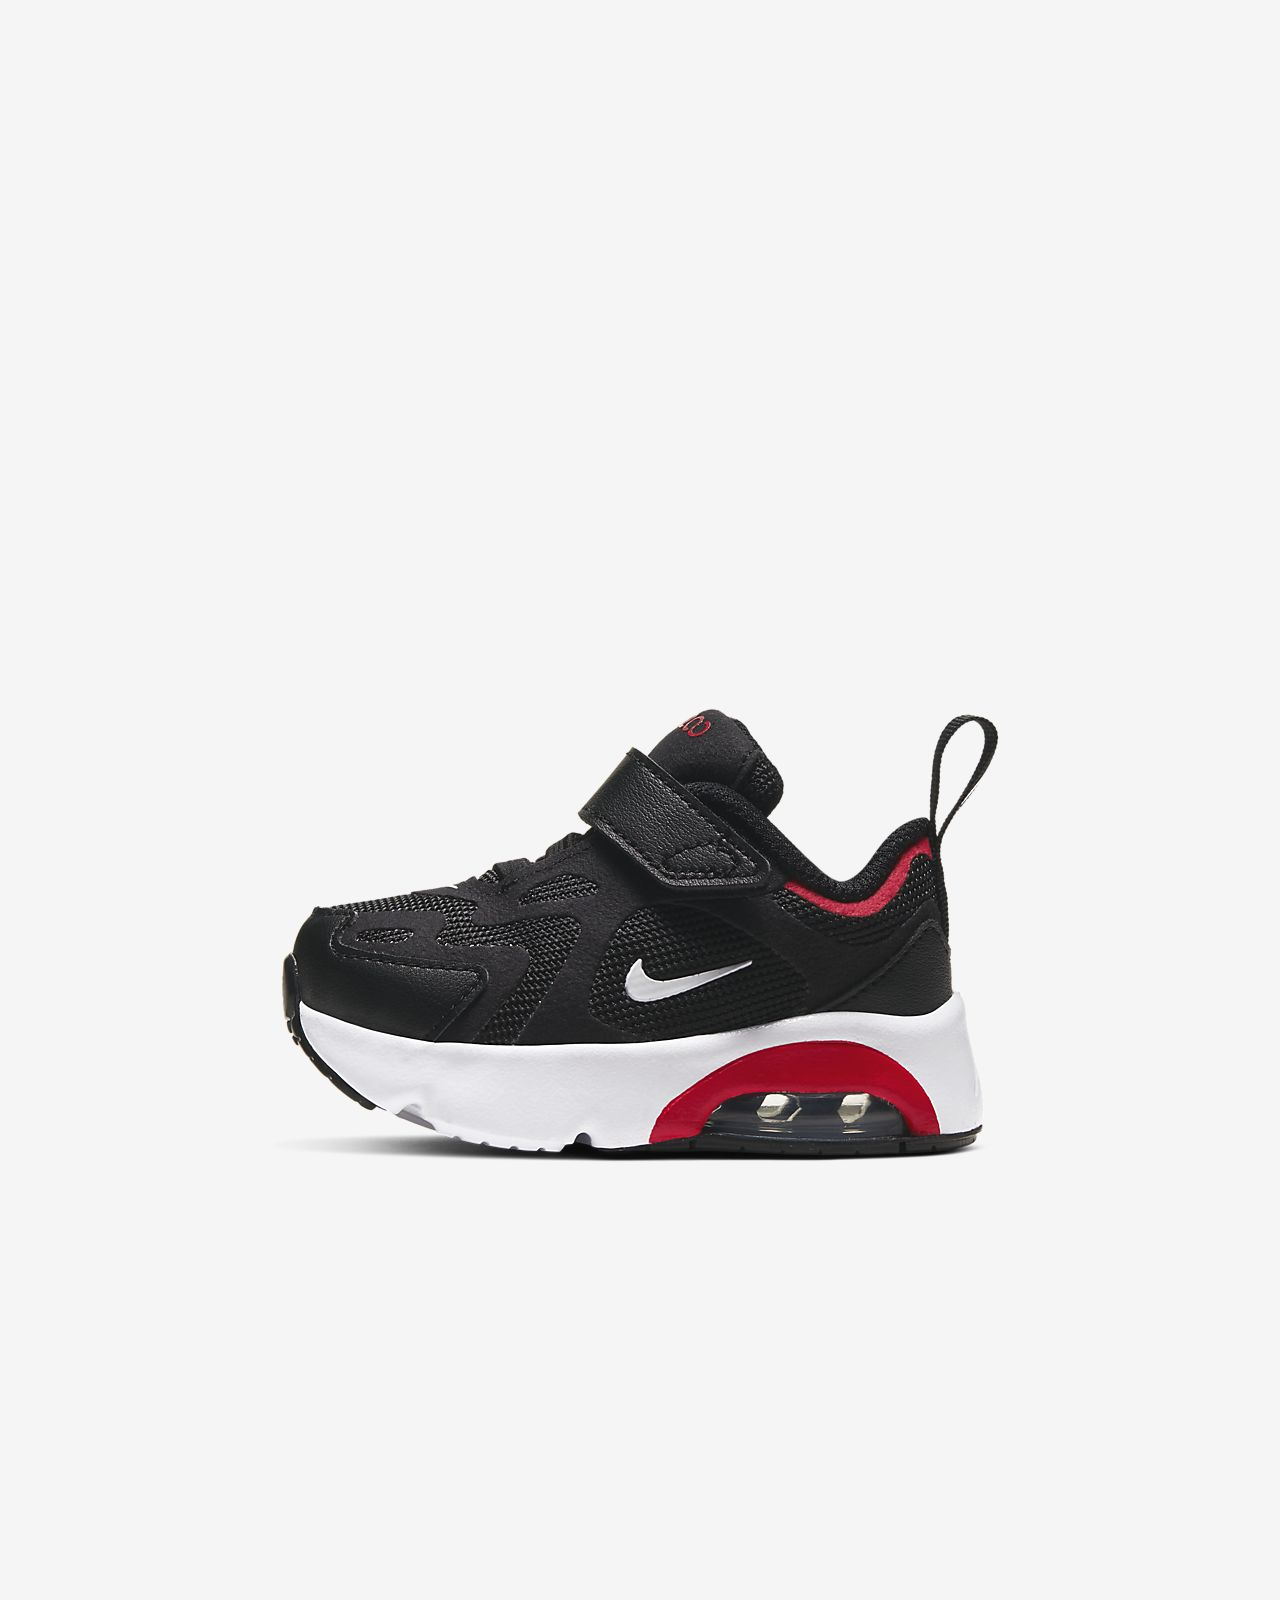 10 Best Nike Toddler Shoes Reviewed & Rated in 2020 | WalkJogRun